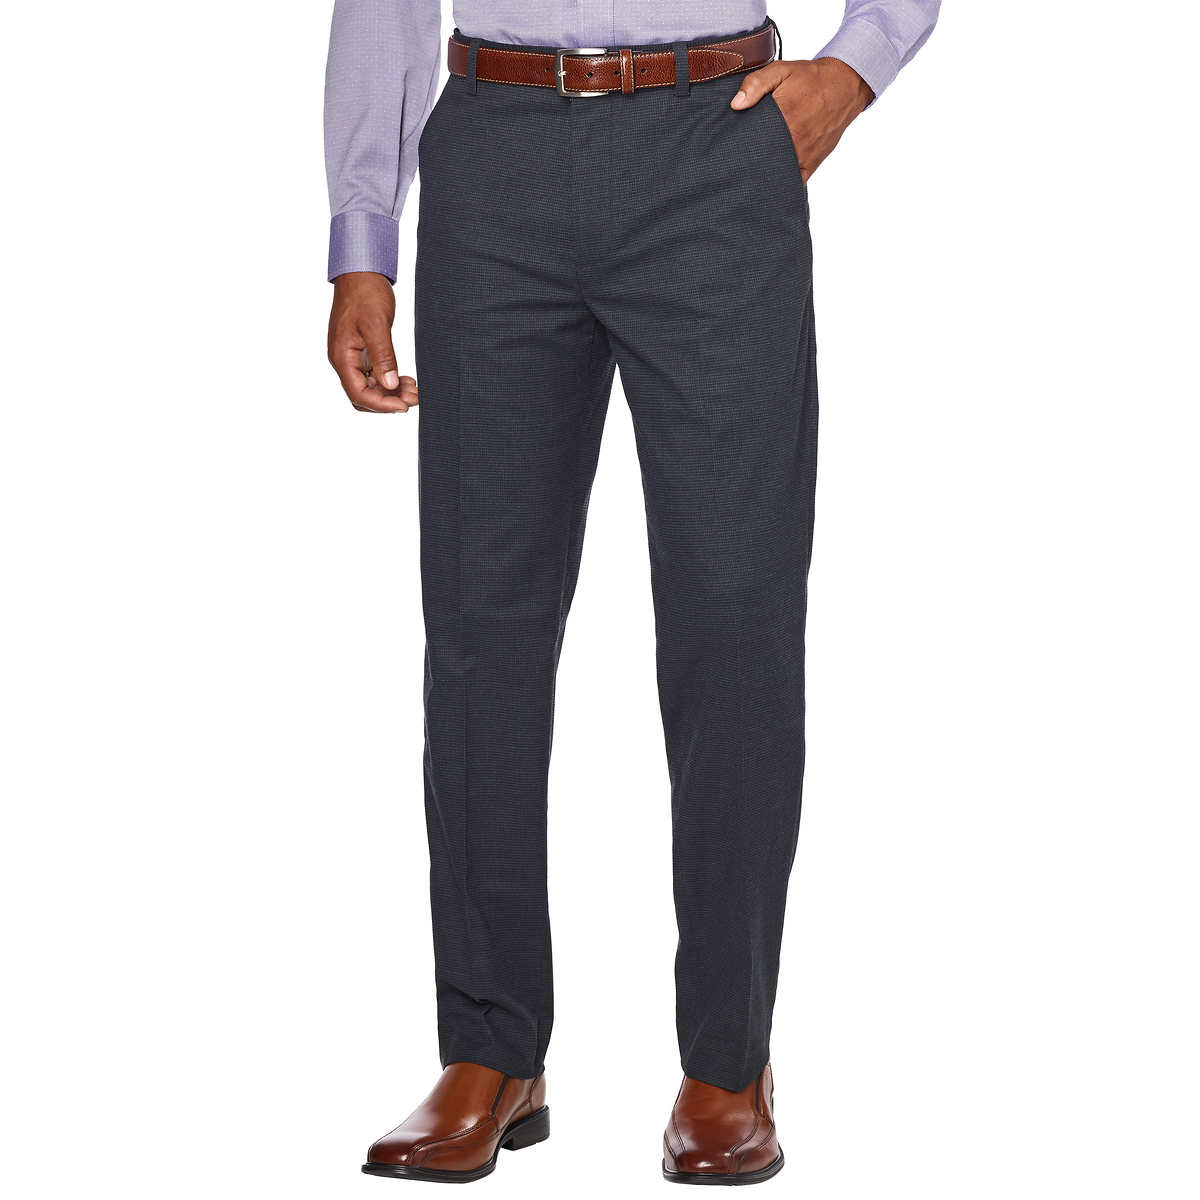 6158250cddfb Kirkland Signature Men s Non-Iron Comfort Pant. black 1 black 1